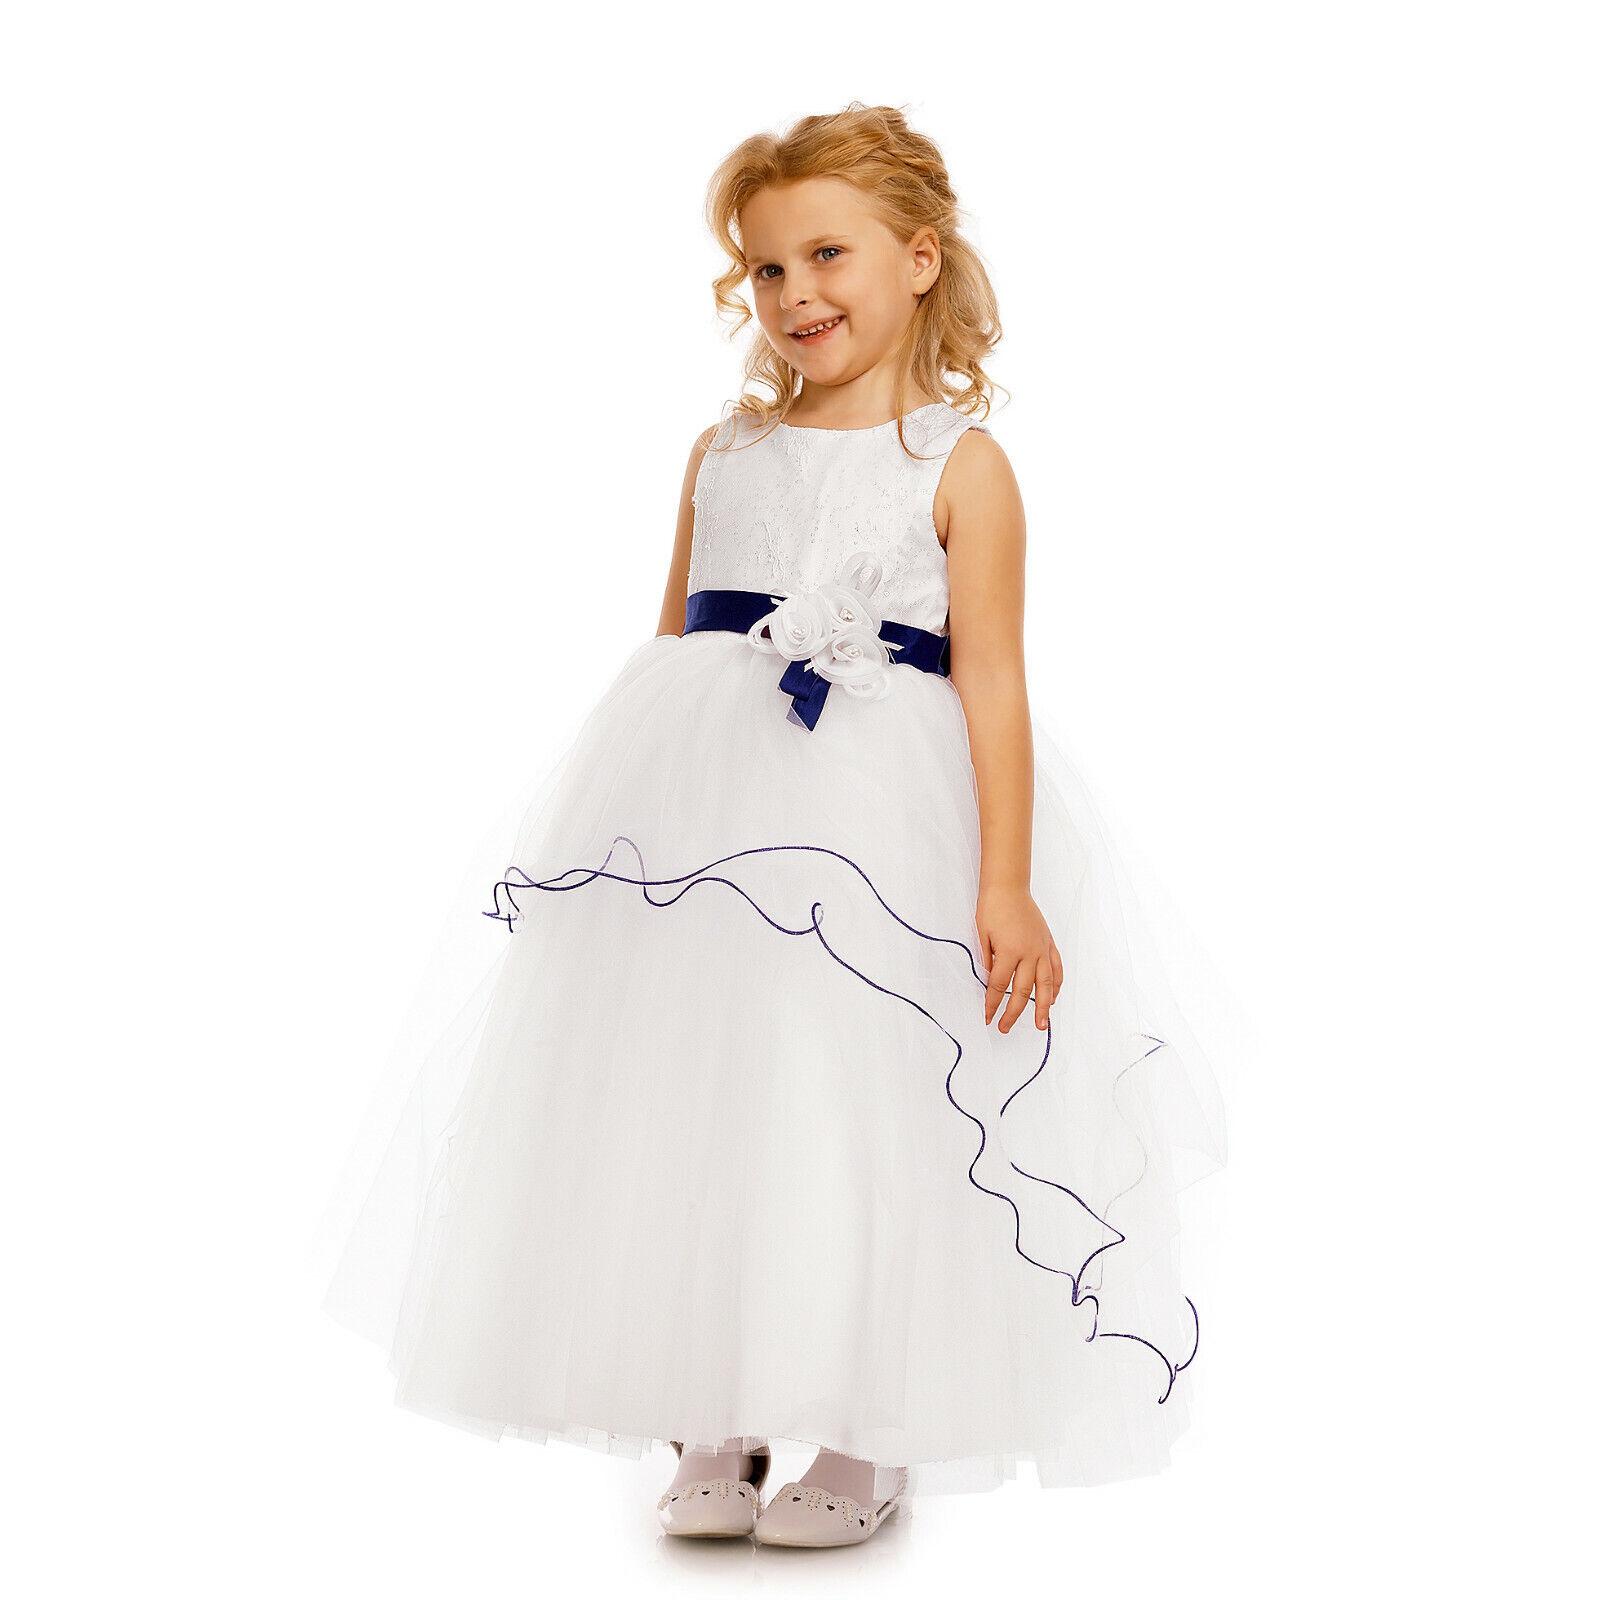 Bridesmaid Dress Flower Girl Party Dress Pink Blue Purple 2 3 4 5 6 7 8 9 Years